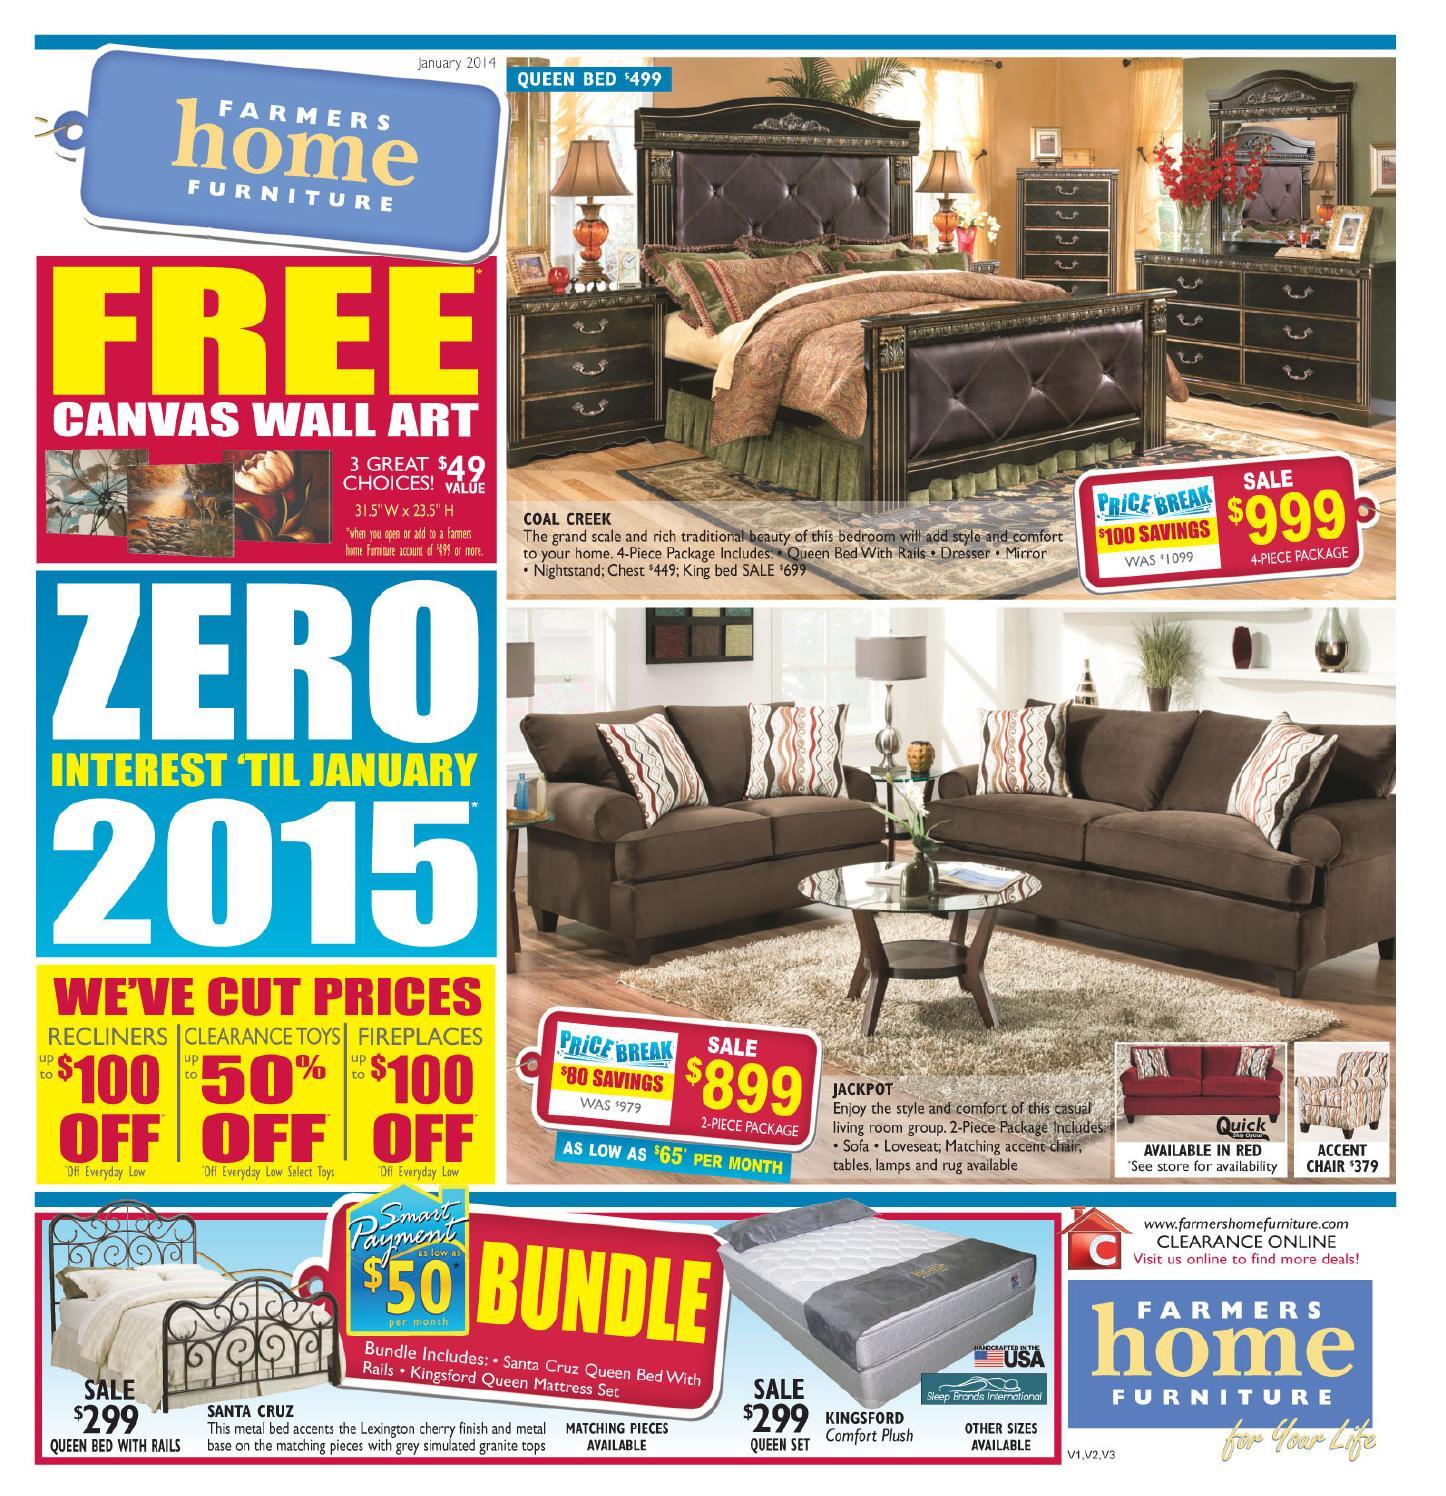 Farmers Home Furniture Lavonia Ga